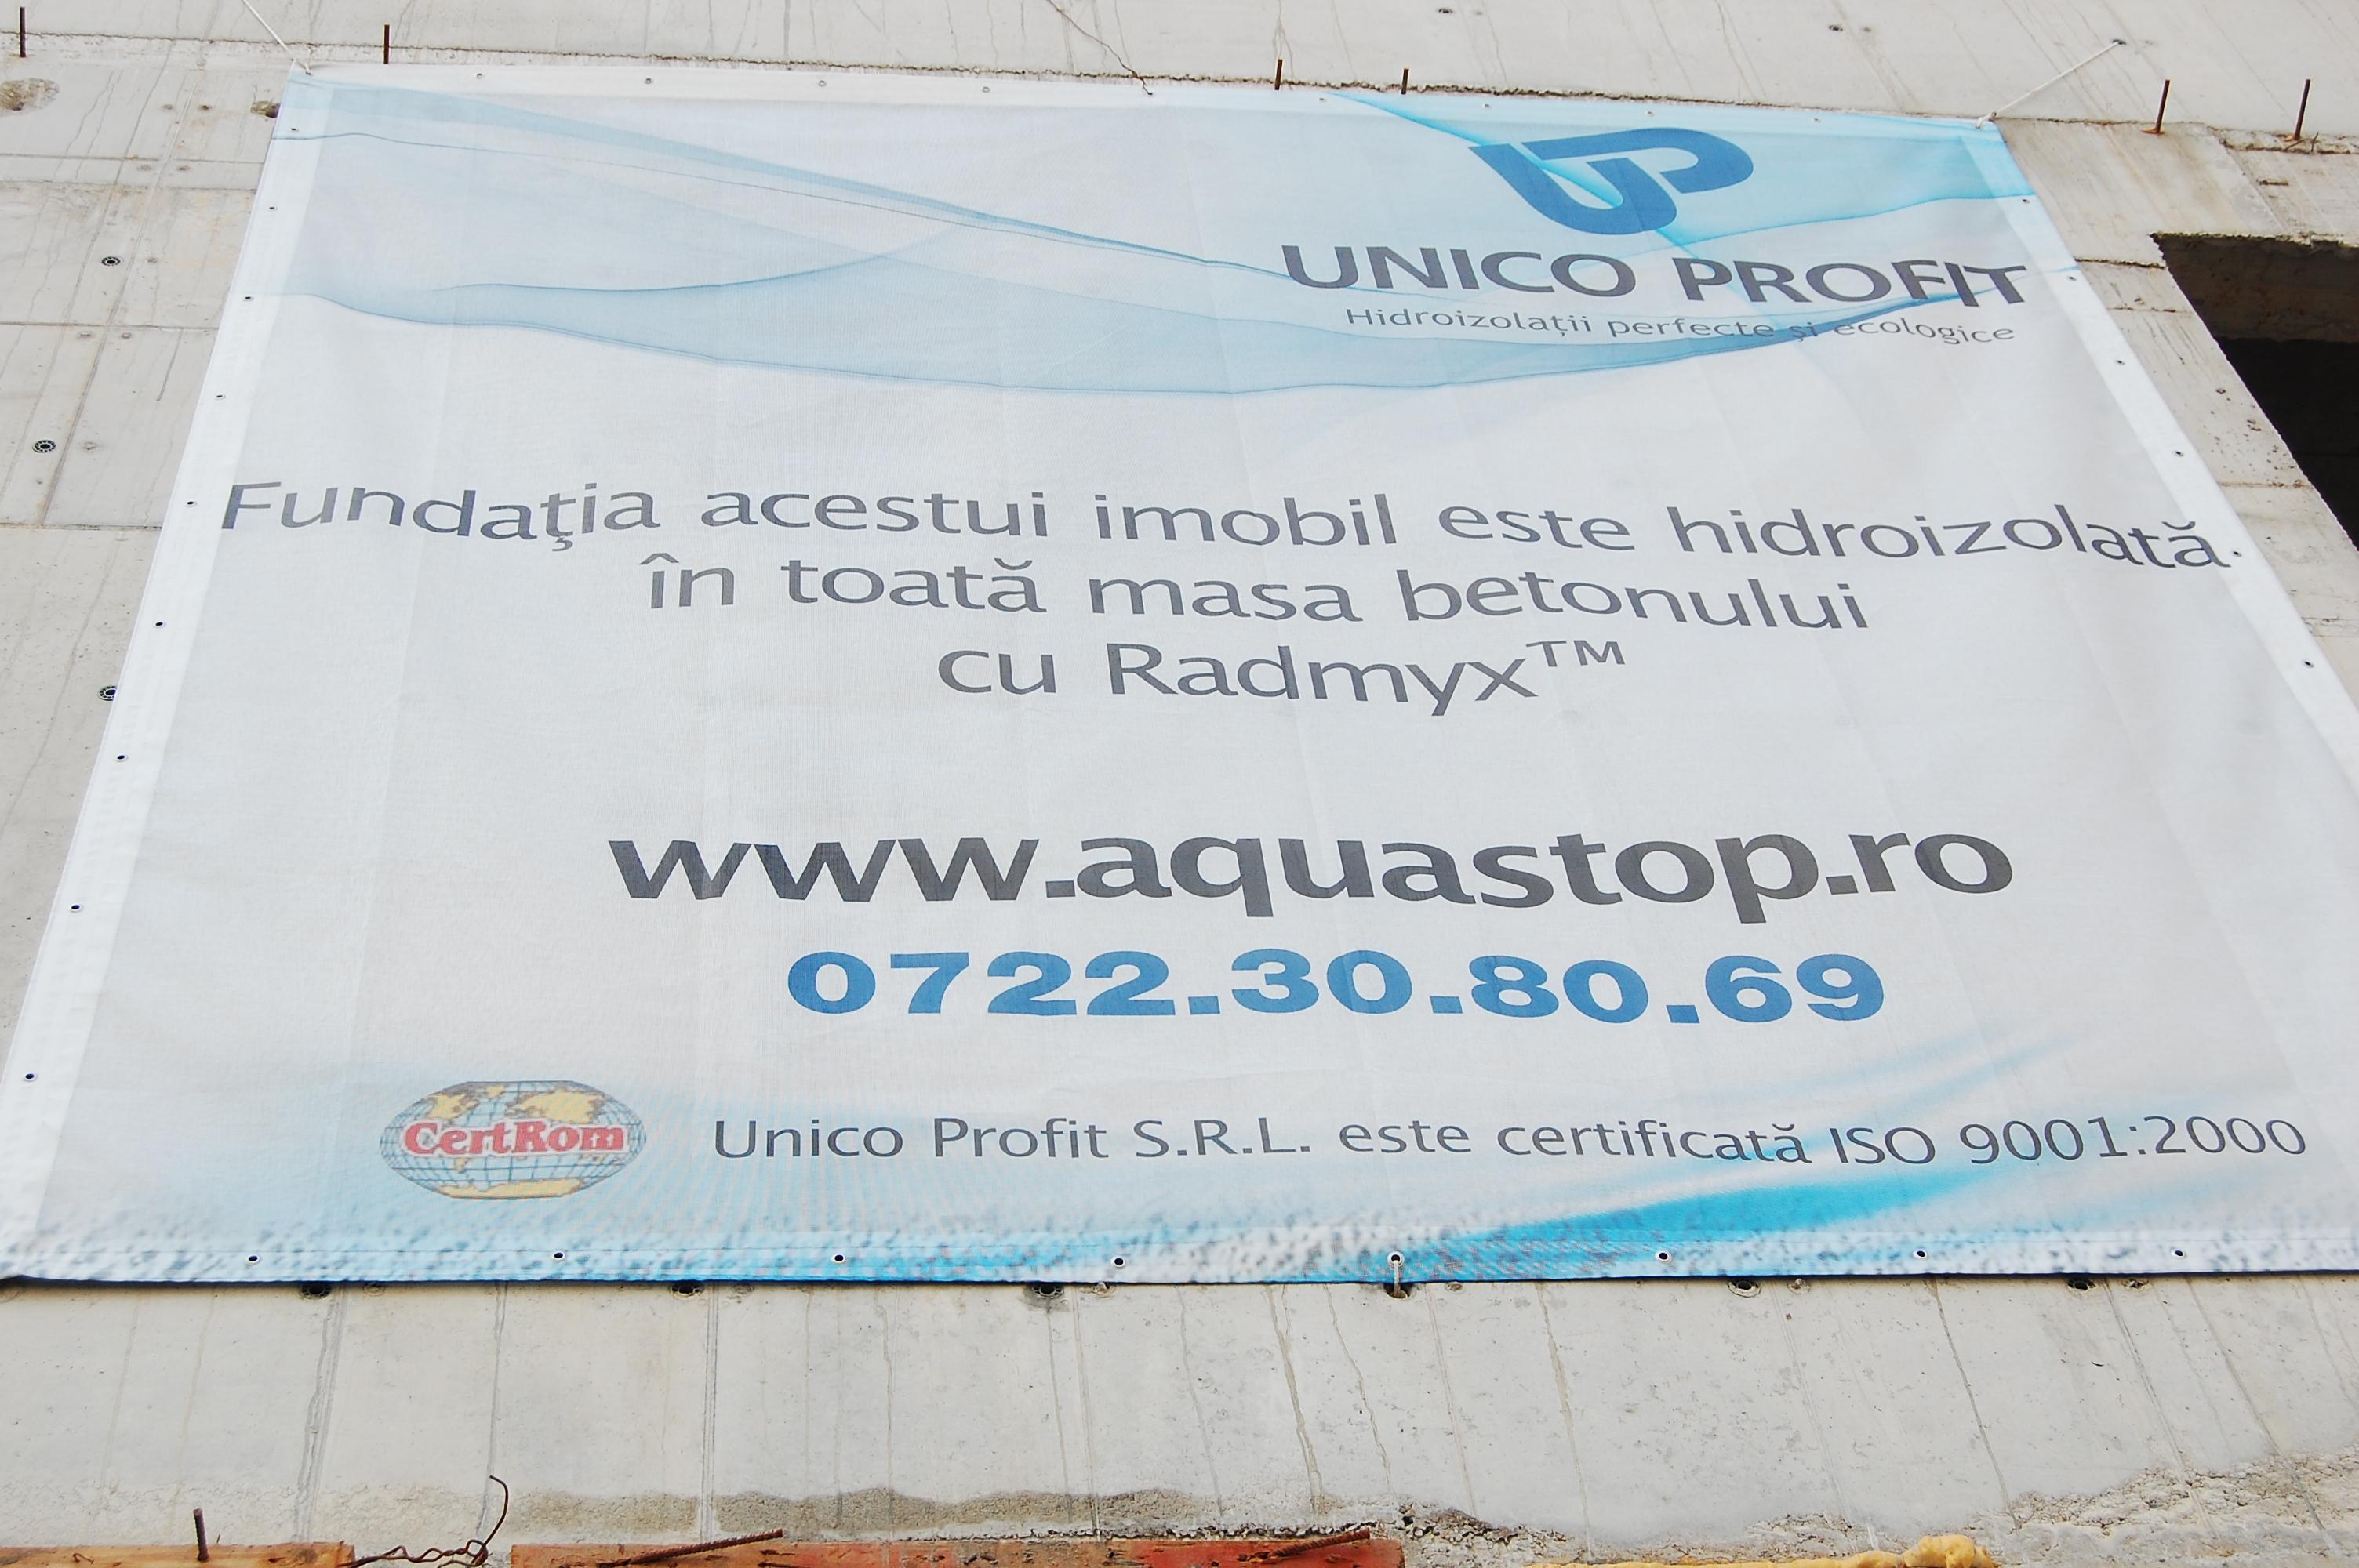 Aditiv in beton - Co-MARK-Co Group - Delea Noua UNICO PROFIT - Poza 15